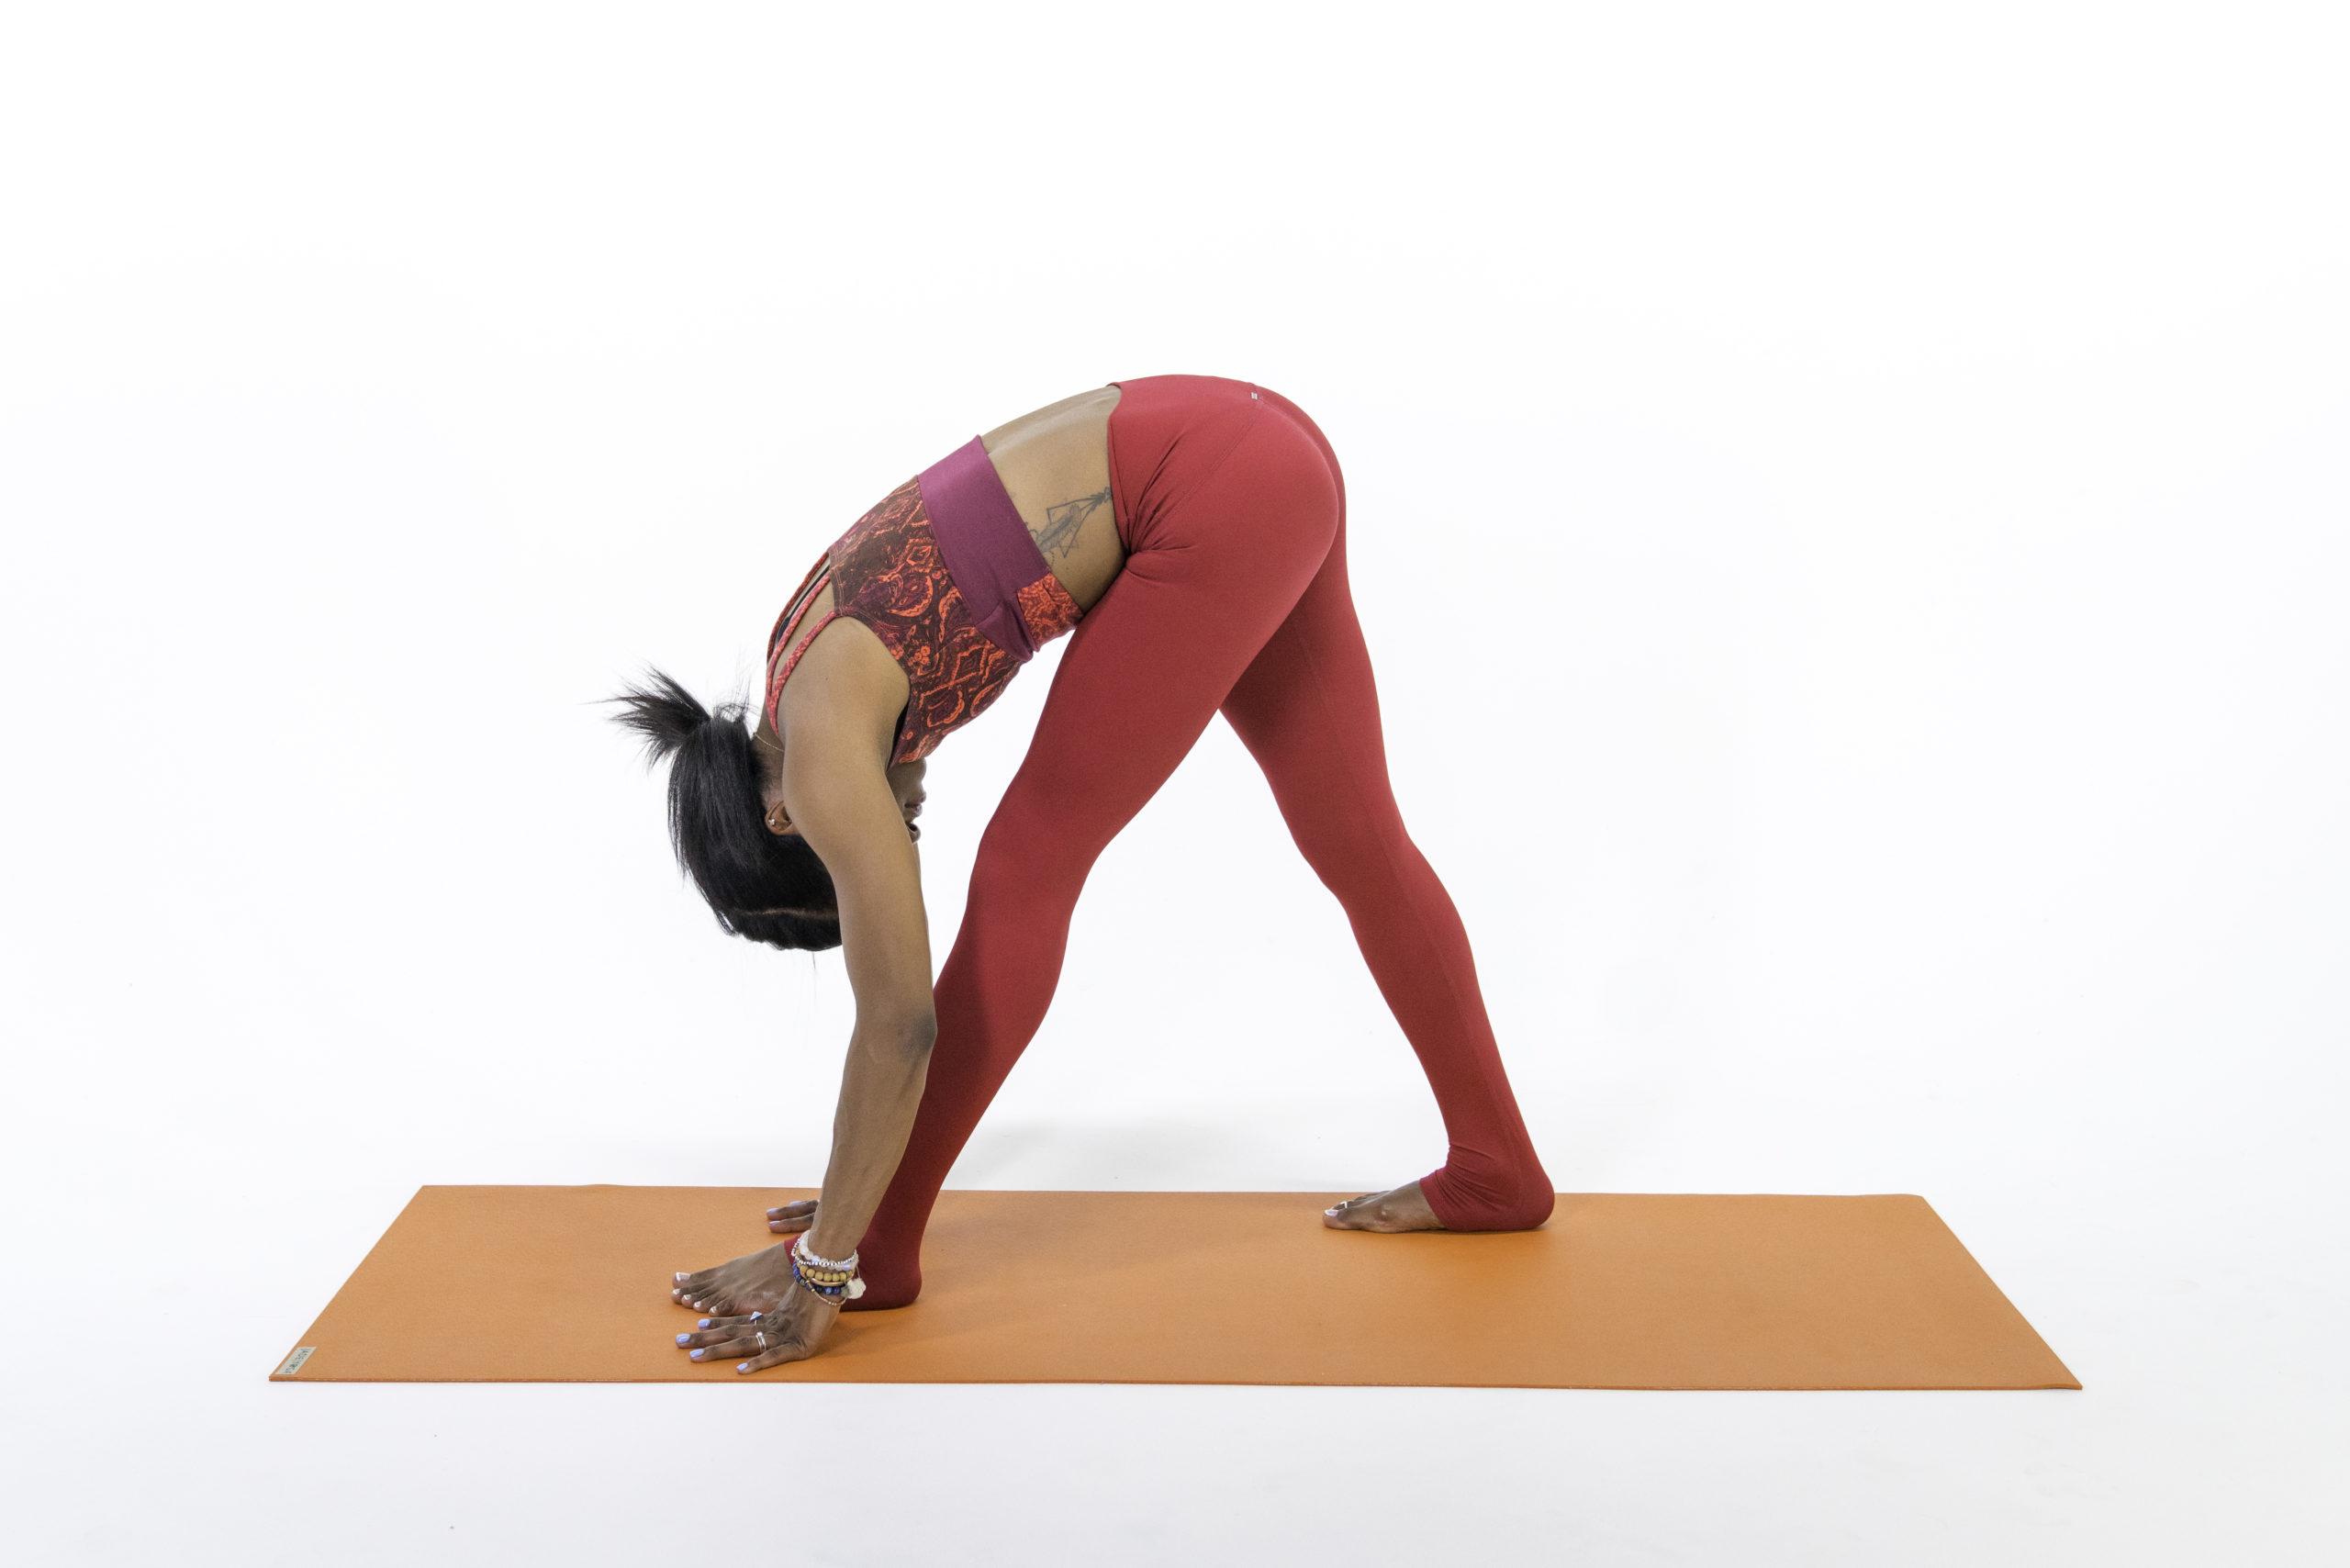 Postura-intensa-de-estiramiento-lateral-Parsvottanasana